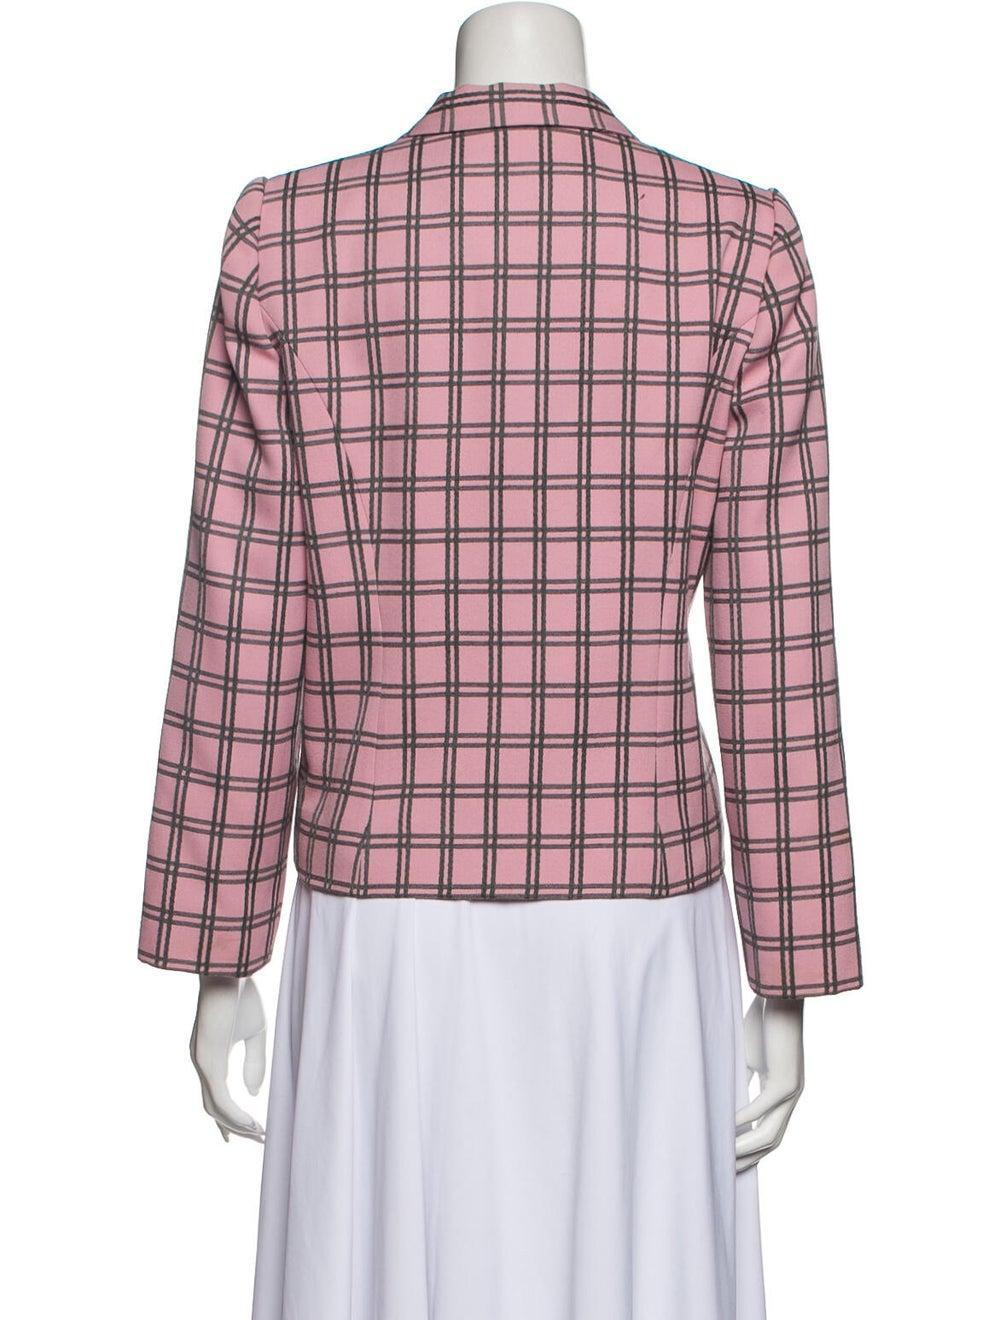 Galanos Vintage Grid Blazer Pink - image 3